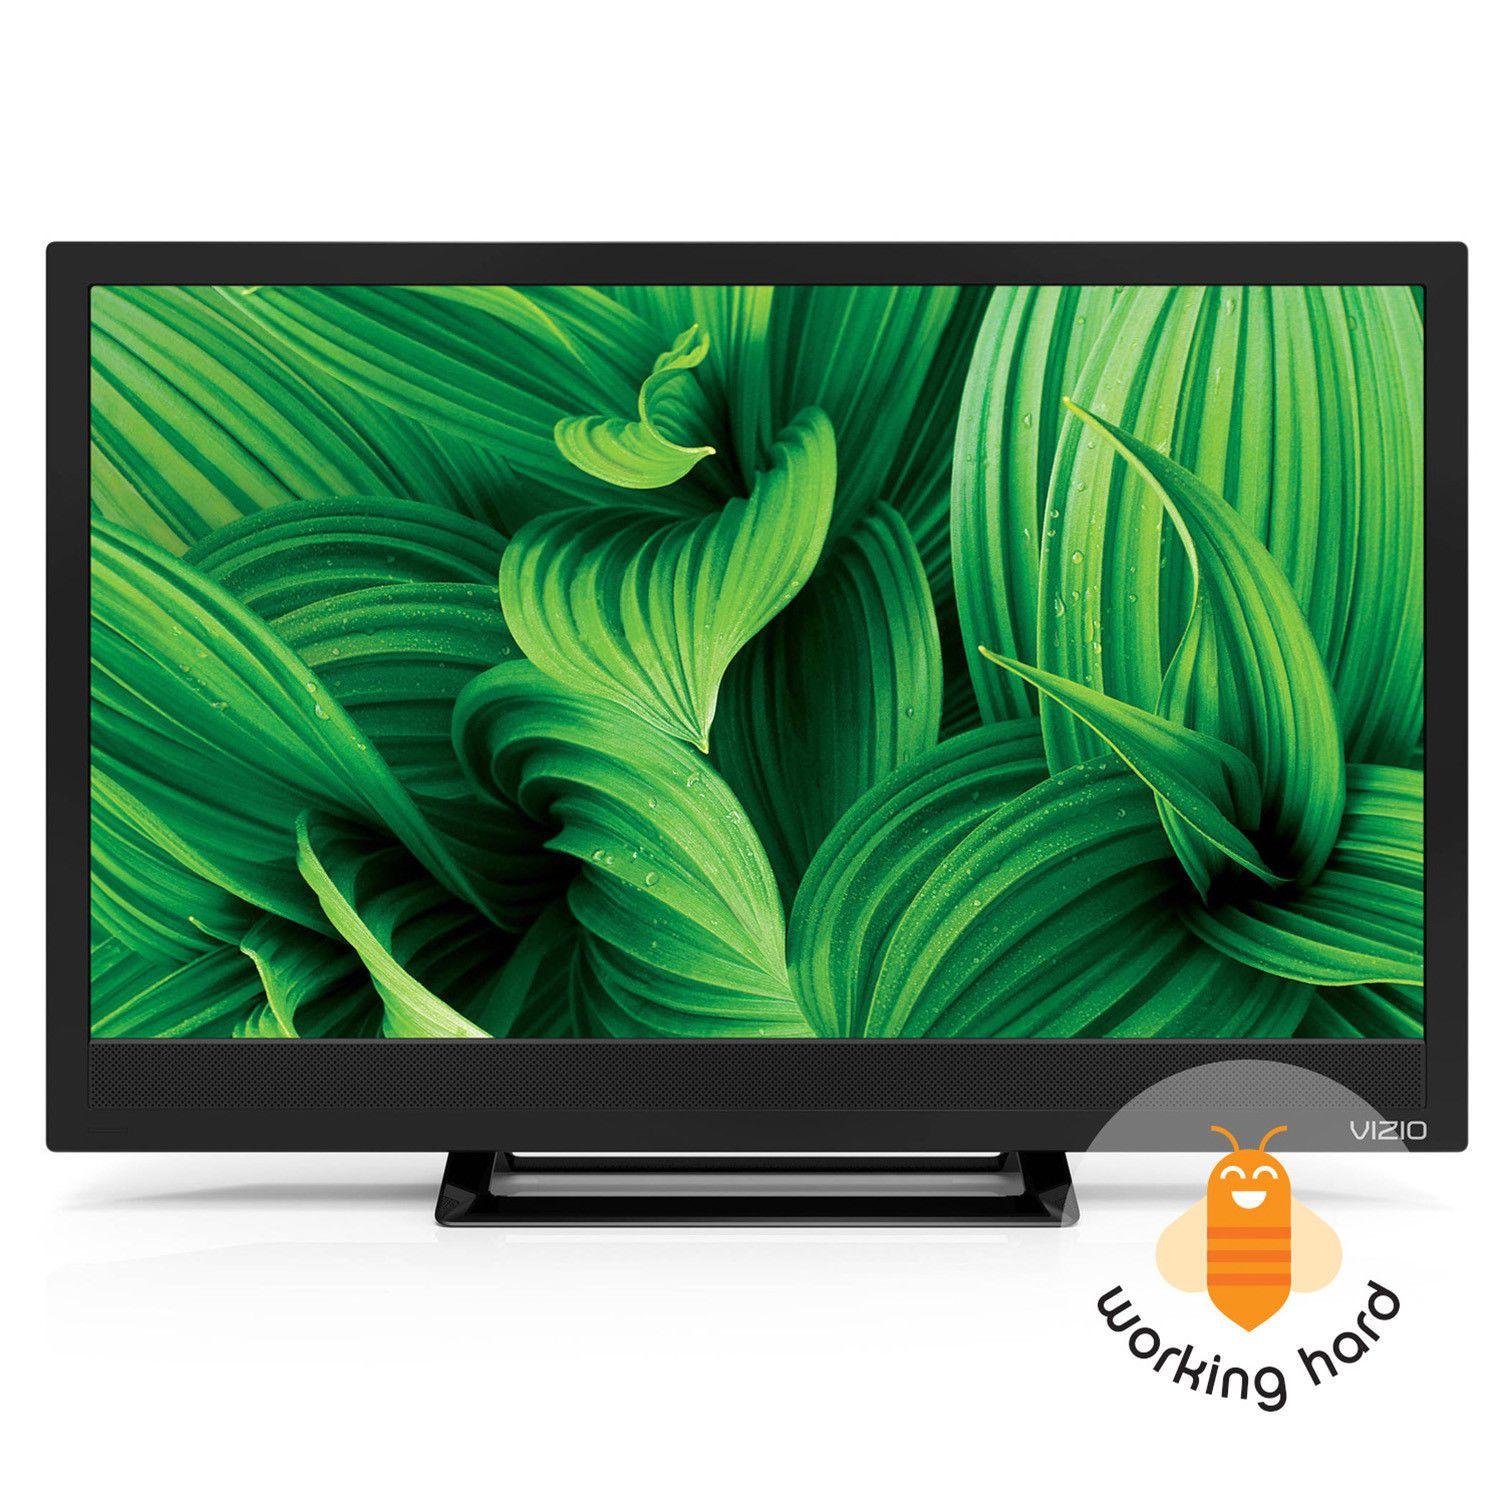 6c1842795 FLAT SCREEN TV HD LED 24 Vizio Class 720p HDMI Wall Mountable Black  Refurbished